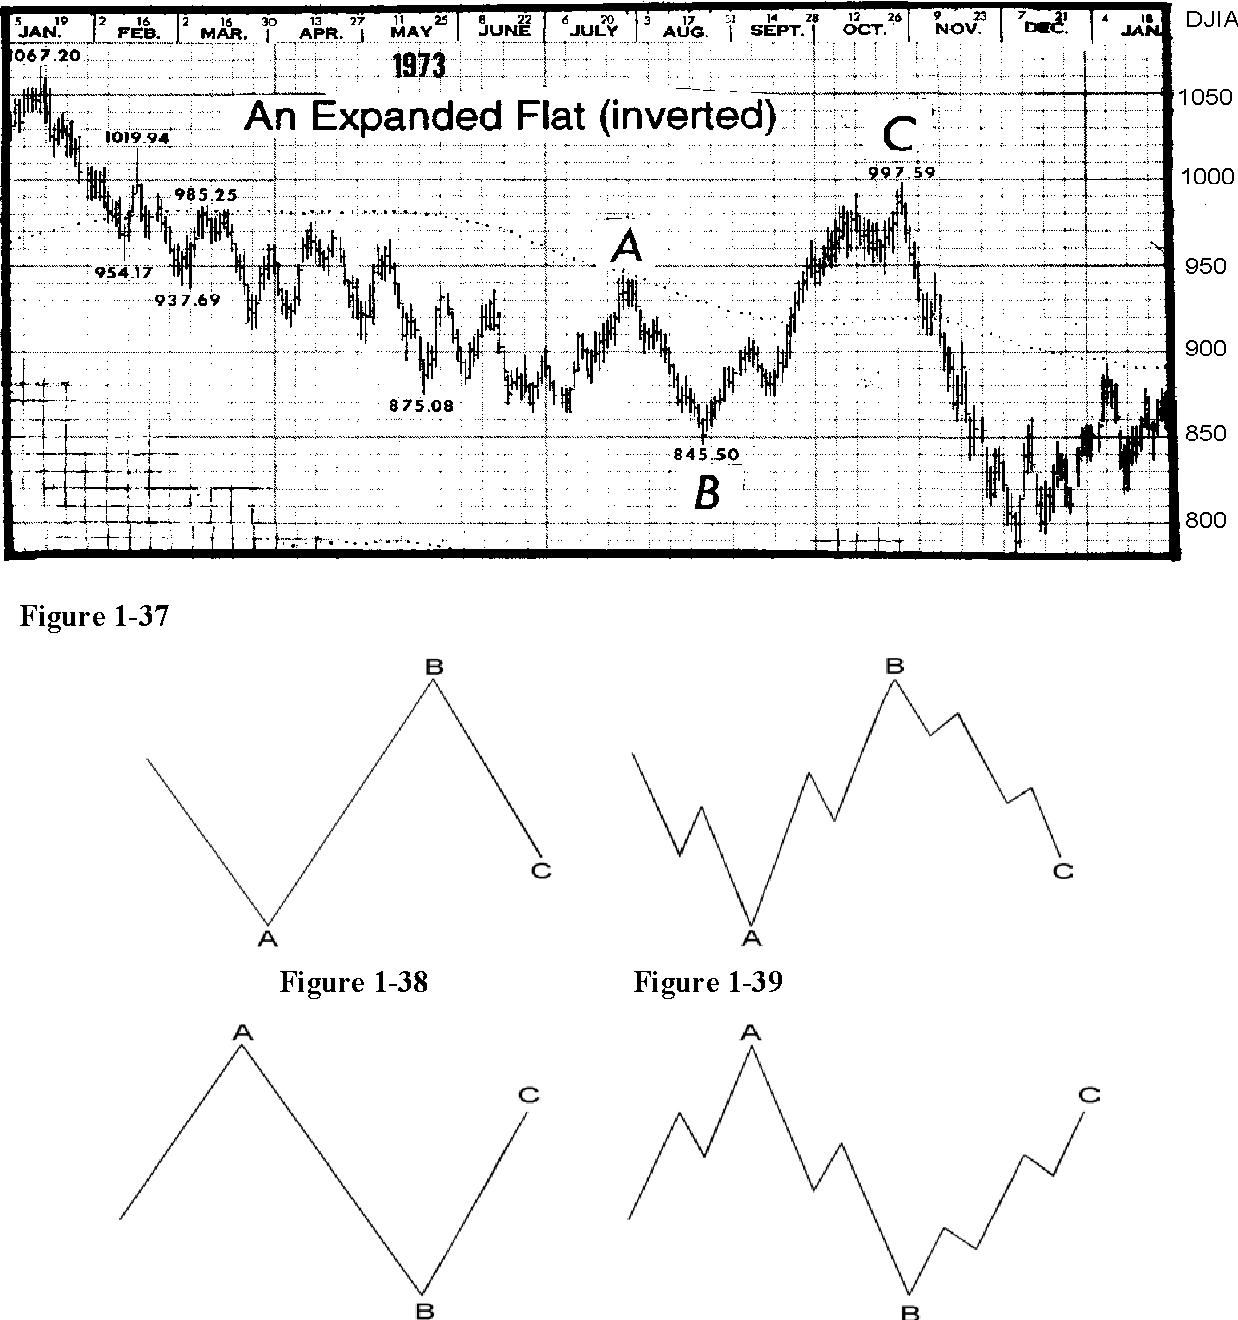 figure 1-38